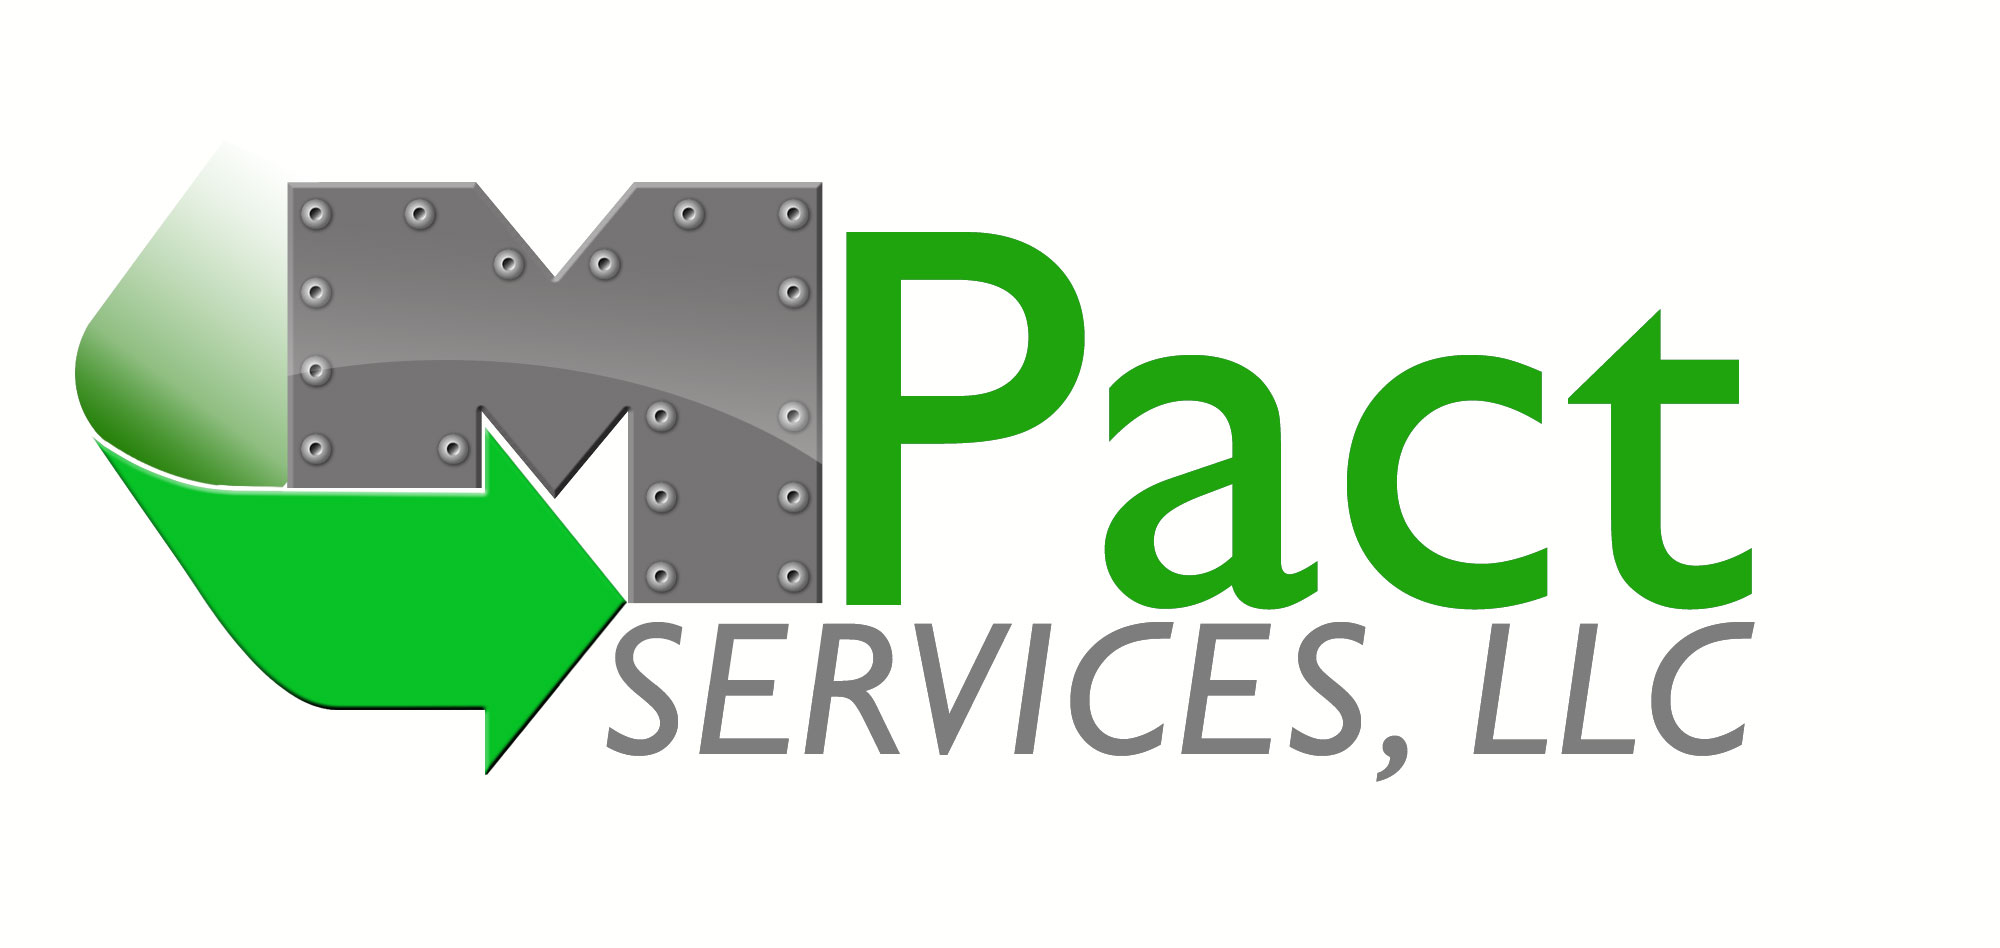 MPact Services, Inc.